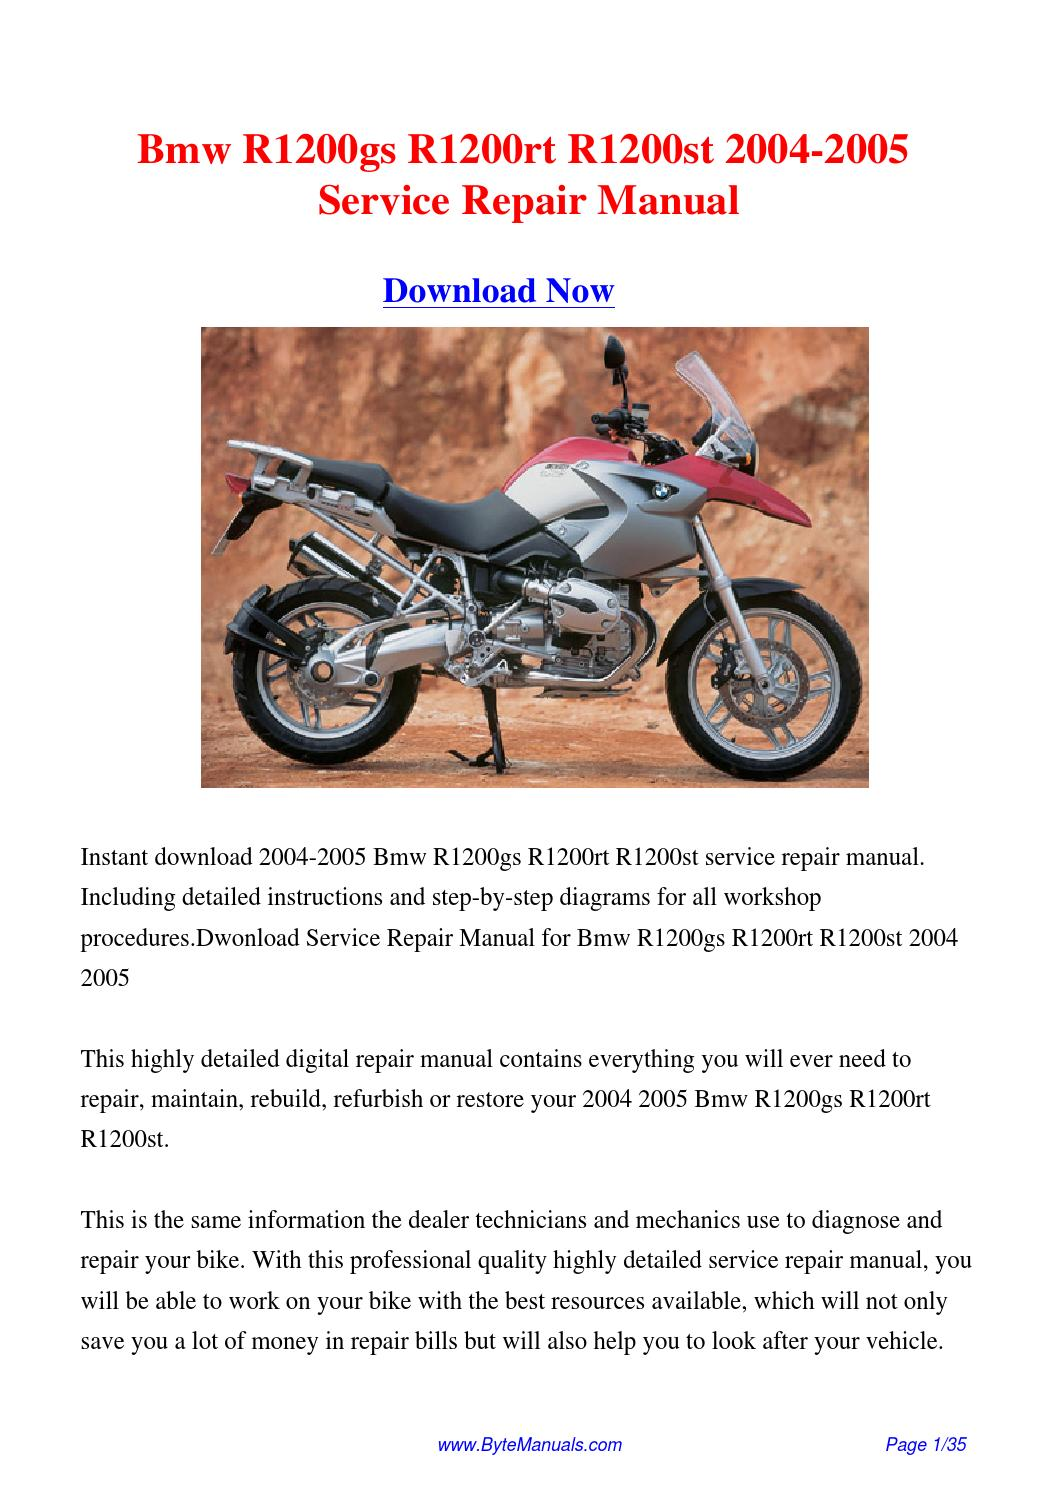 Bmw r1200rt radio manual pdf